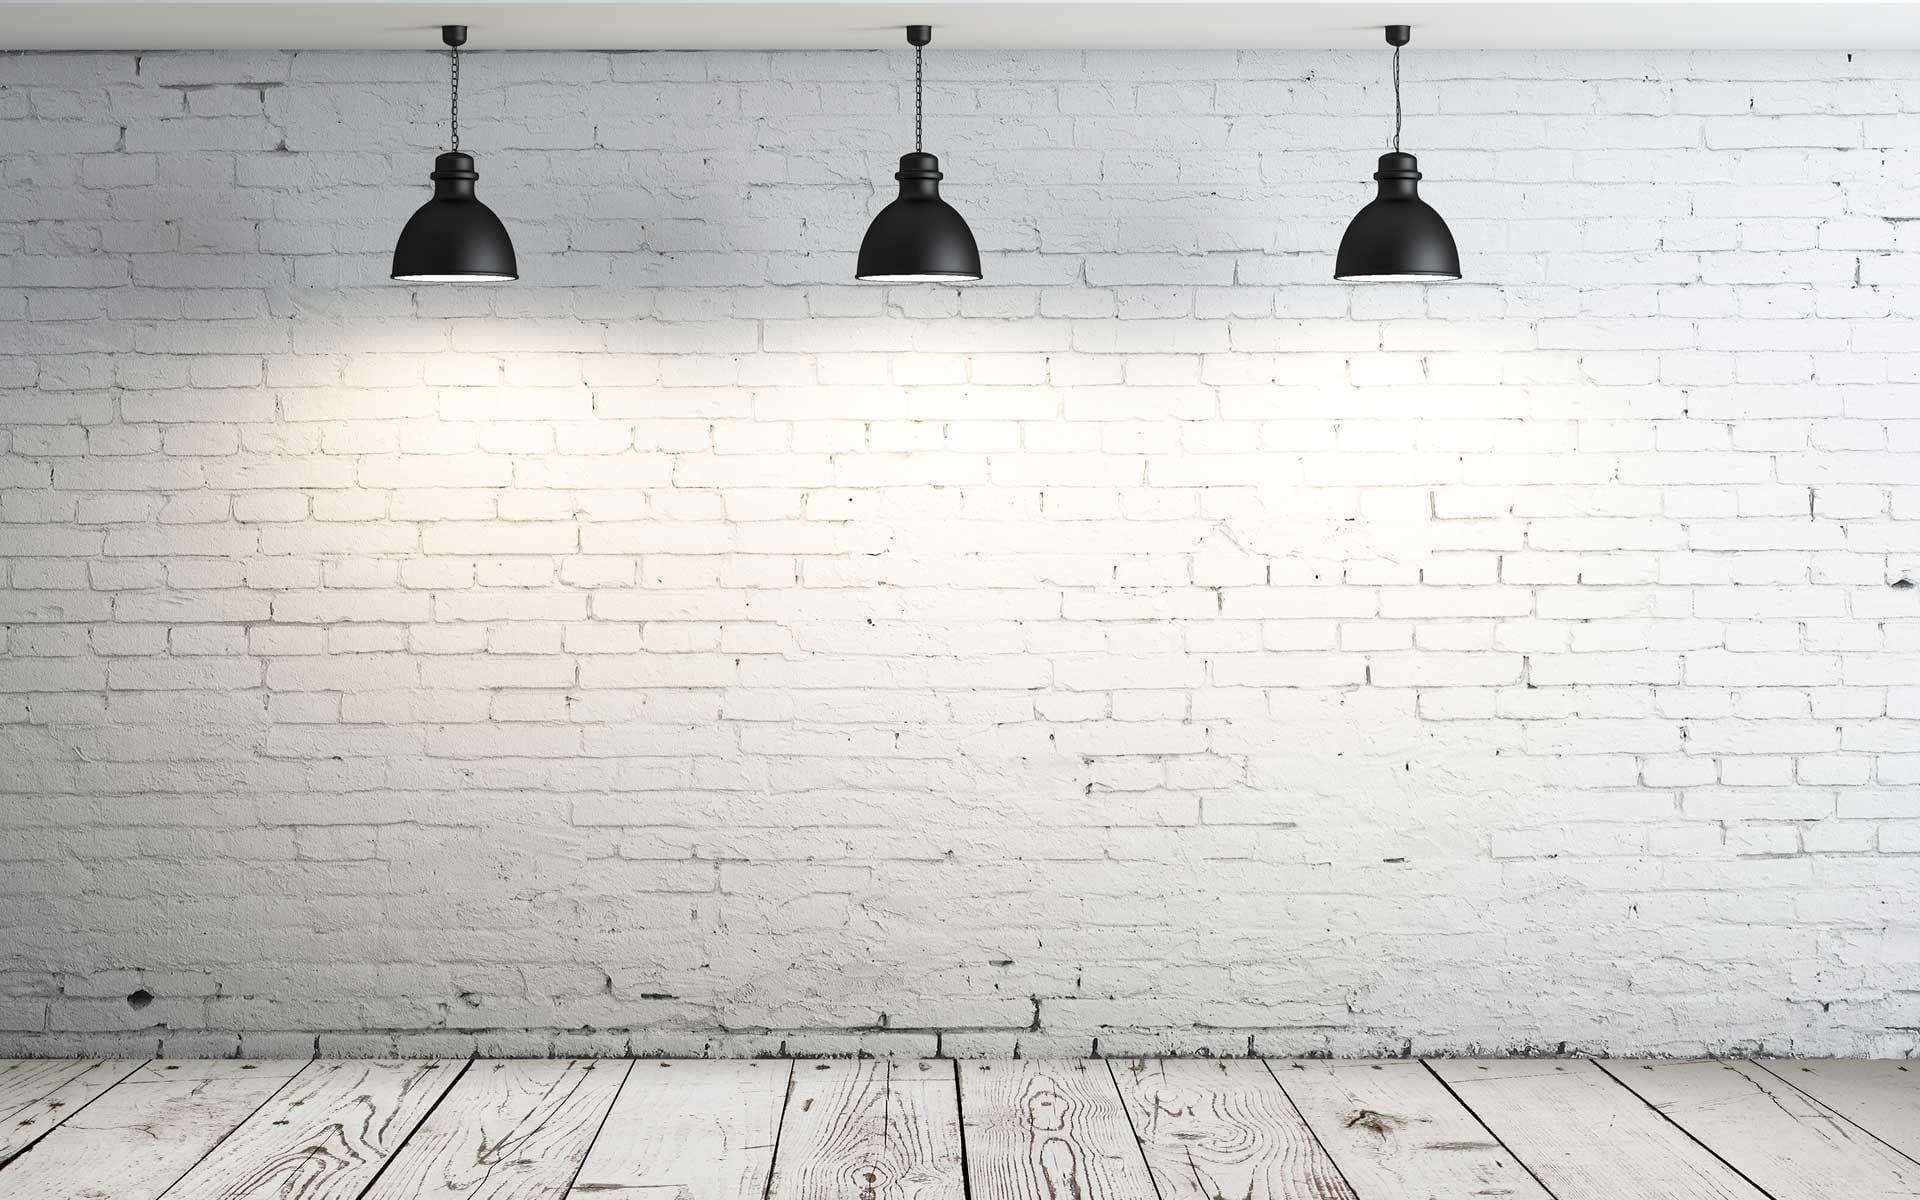 Three Black Pendant Lamps Room Lamp Simple White Wooden Floor Bricks Interior 1080p Wallpaper Hdwallpaper Desktop Latar Belakang Desain Wallpaper Hd